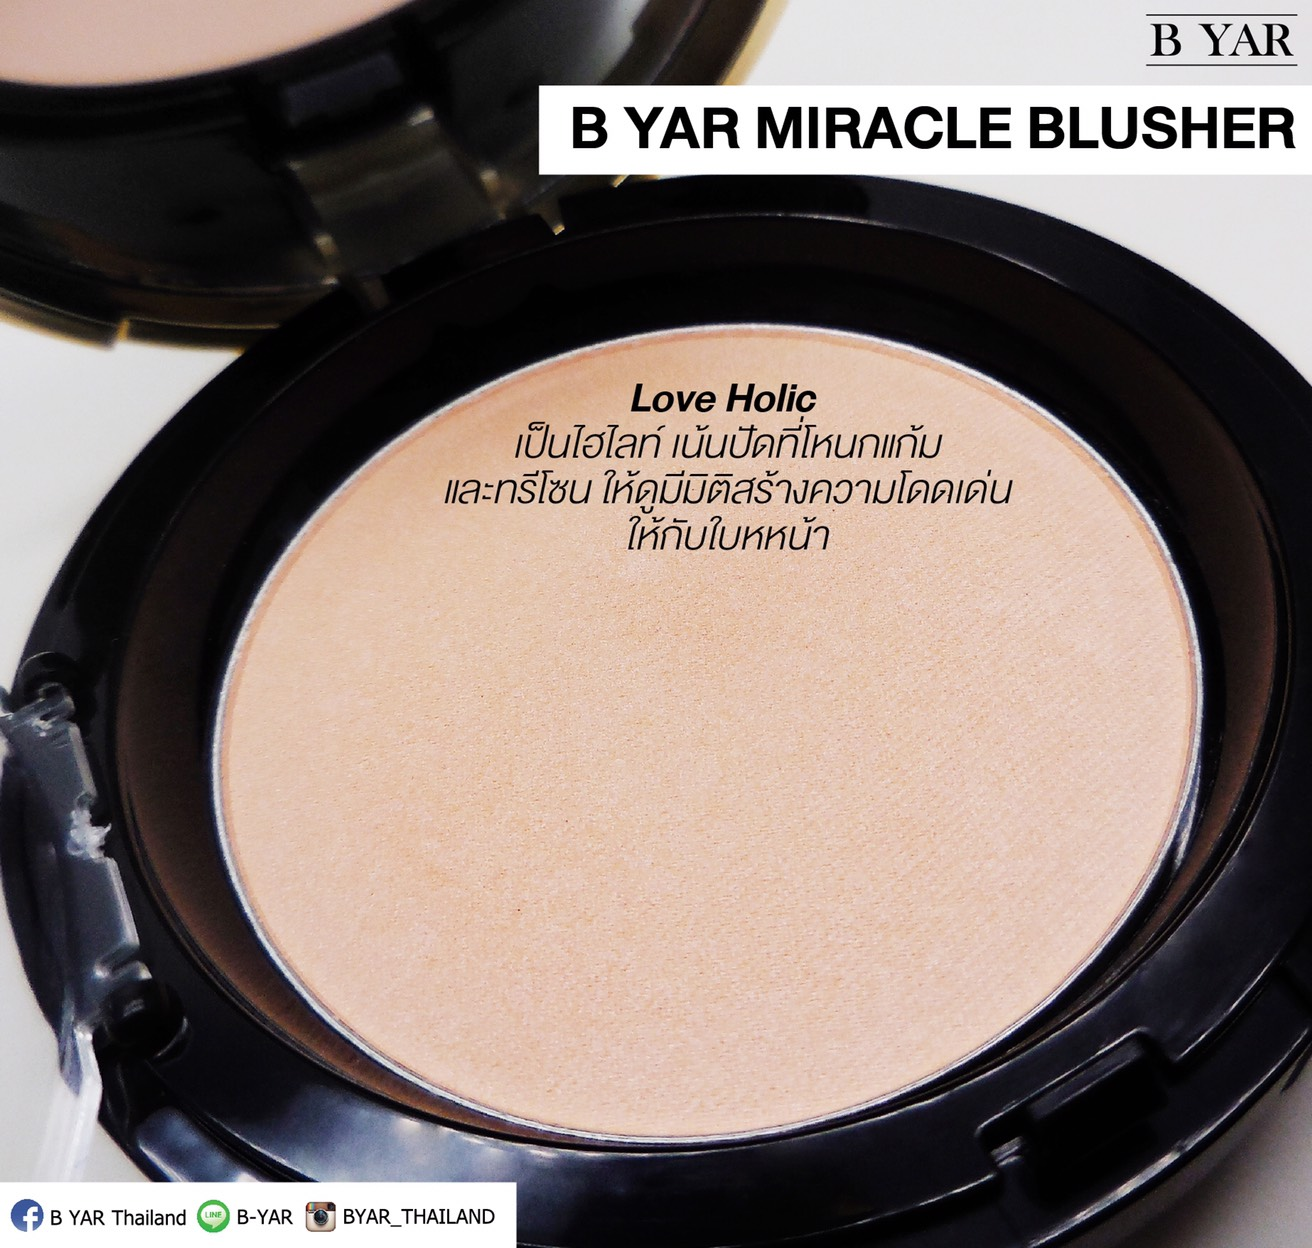 B YAR Miracle Blusher #Love Holic